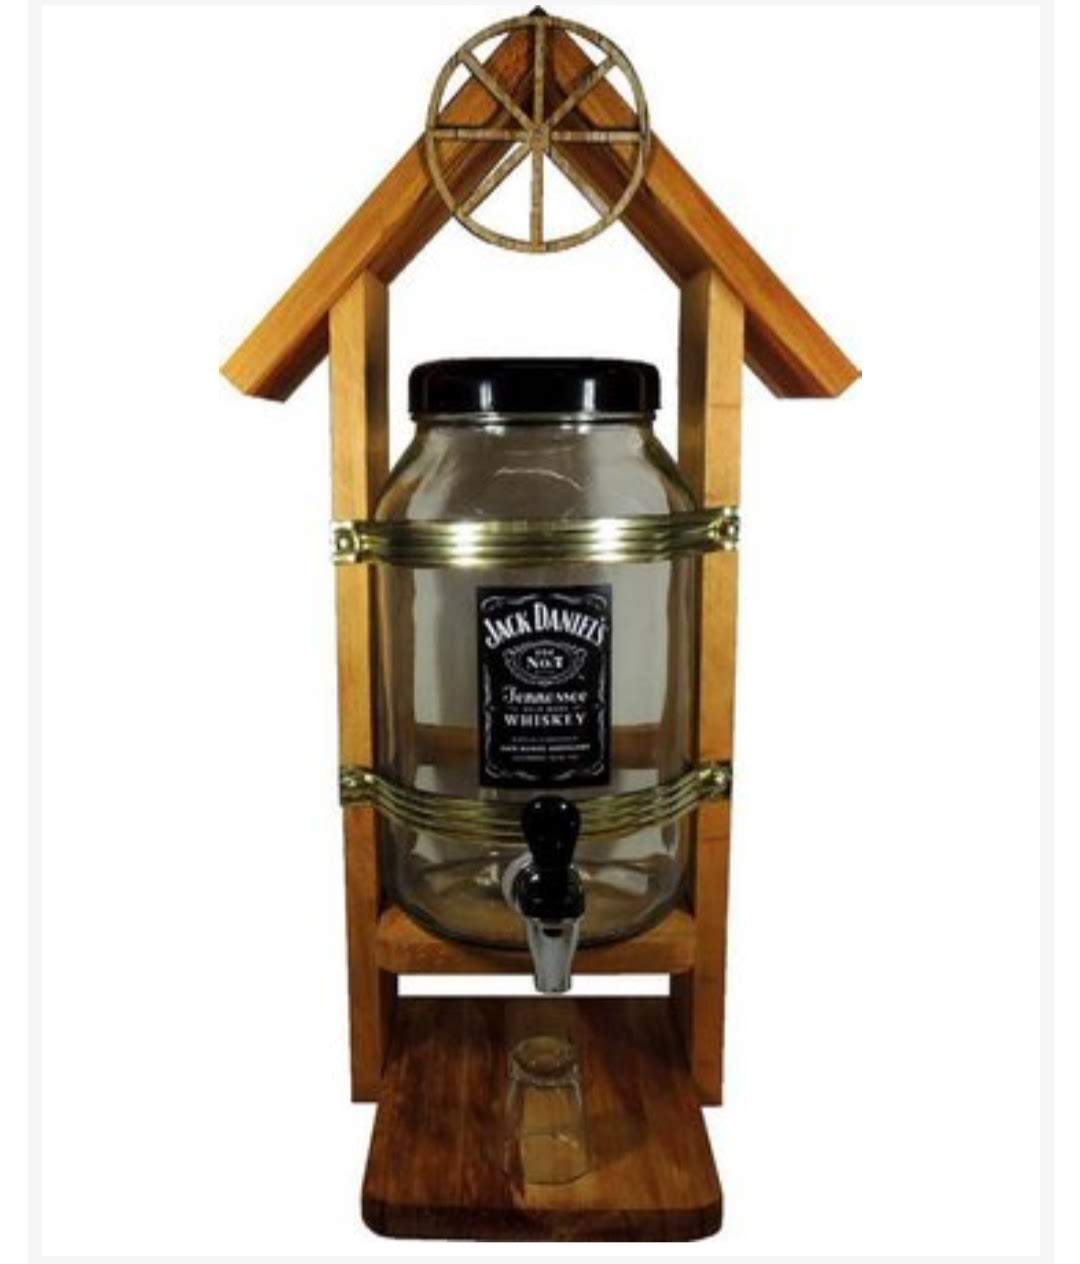 Pingometro Cachaça Artesanal Casinha Madeira Vidro 2L Jack Daniels